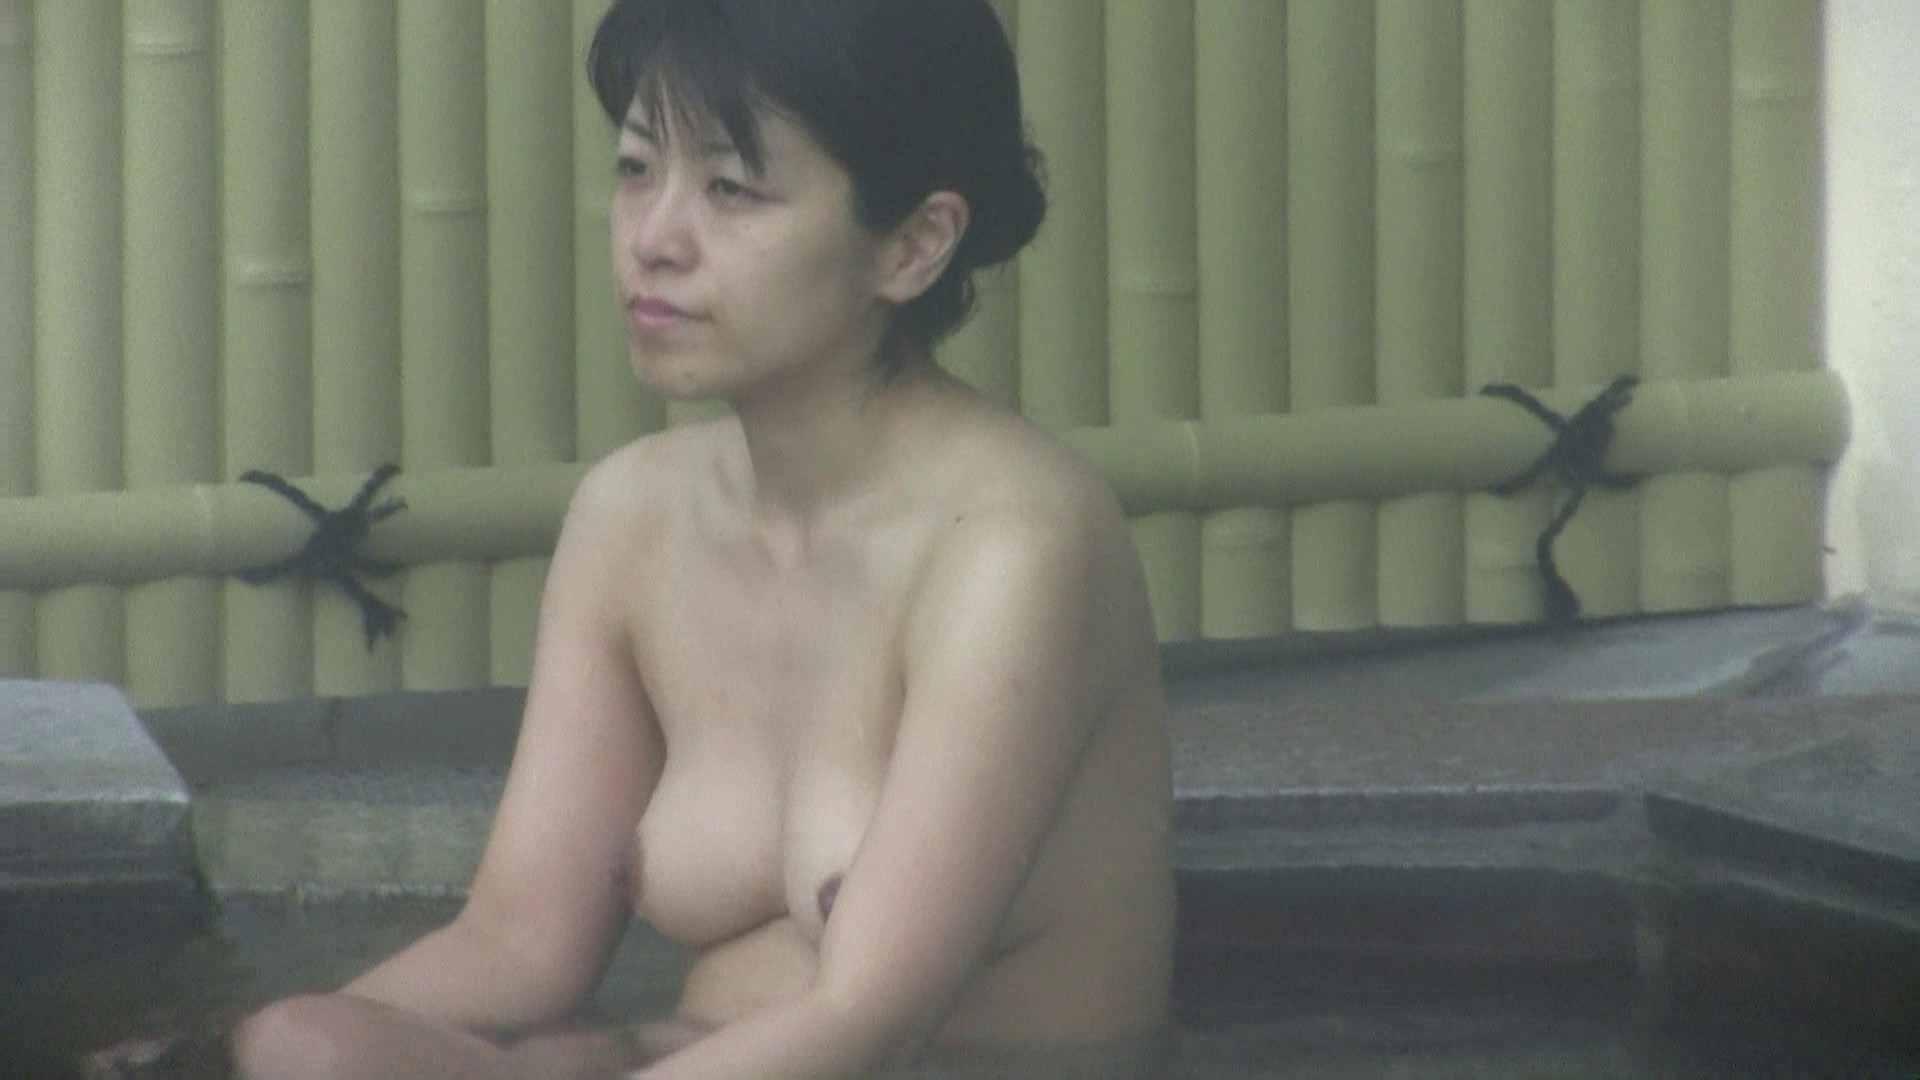 Aquaな露天風呂Vol.585 盗撮 | OLエロ画像  78PICs 25